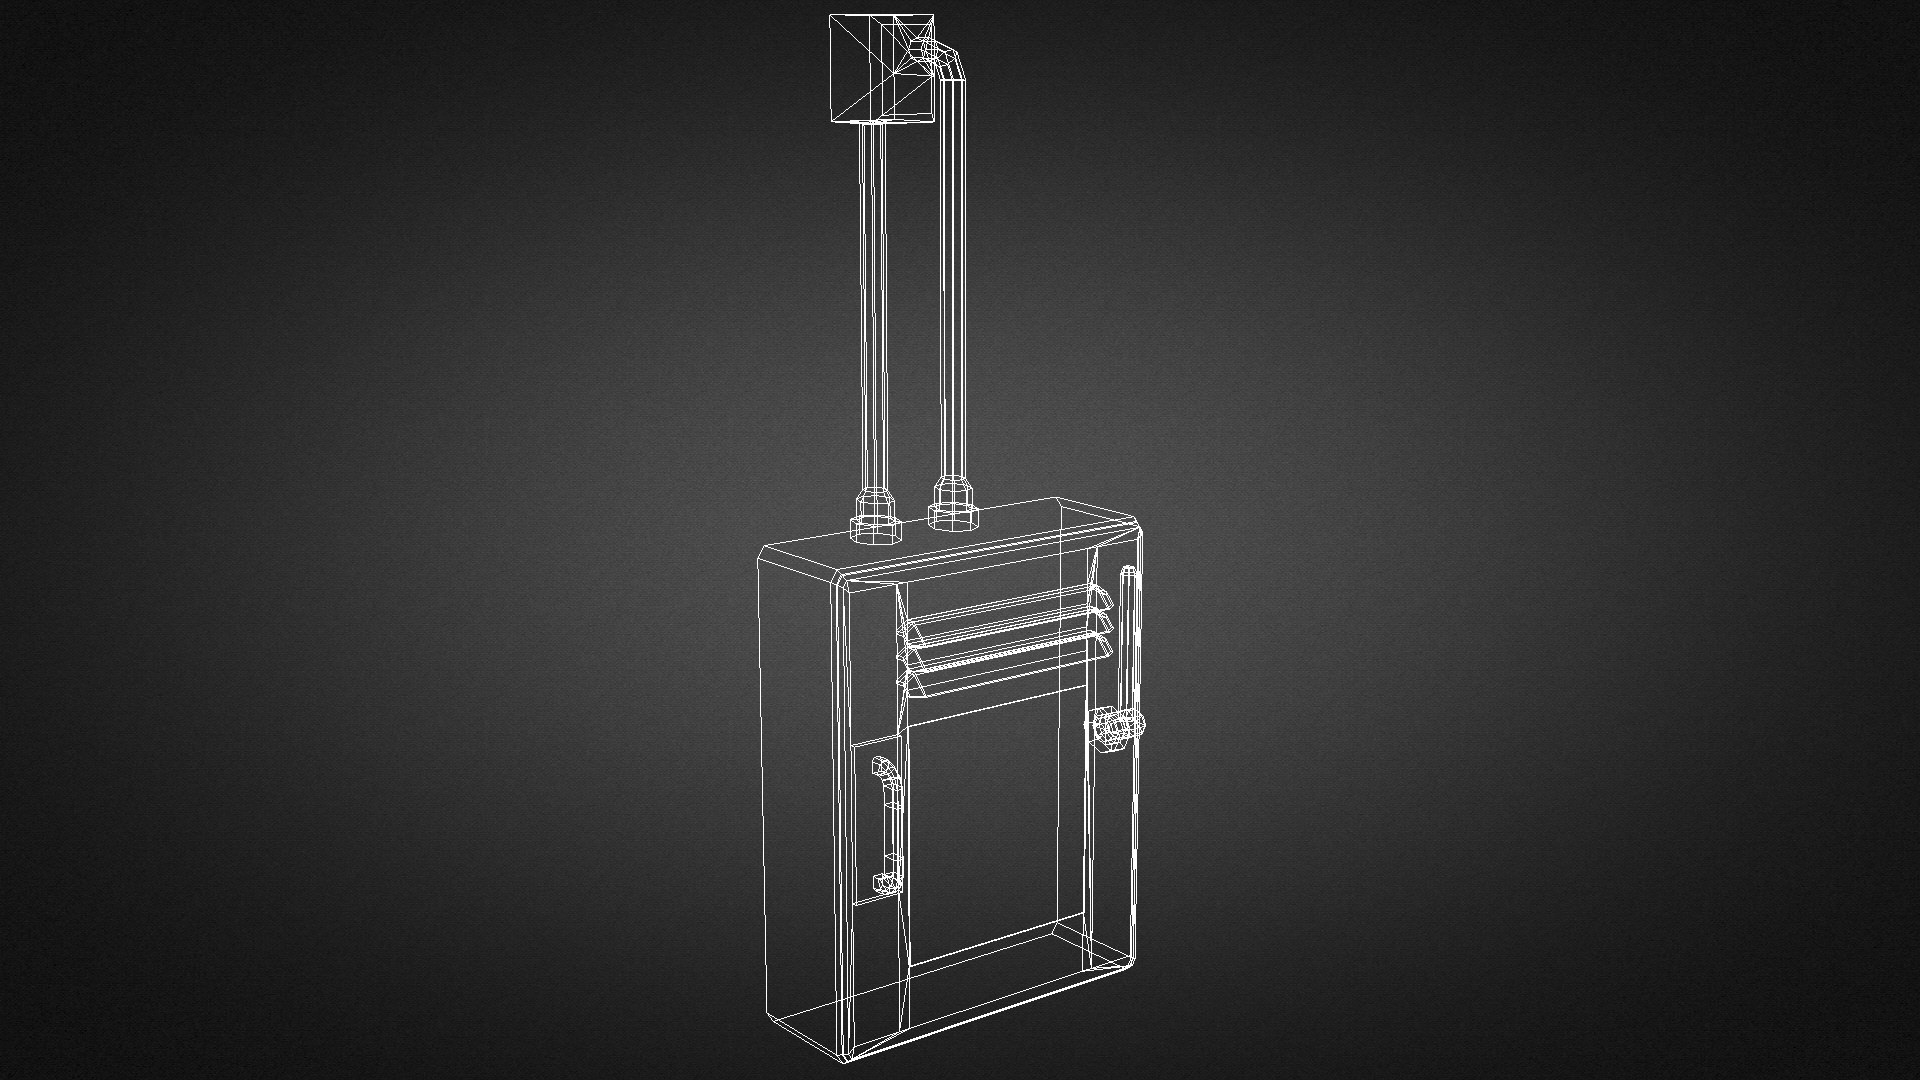 3d model electric fuse box 01 vr ar low poly max obj. Black Bedroom Furniture Sets. Home Design Ideas